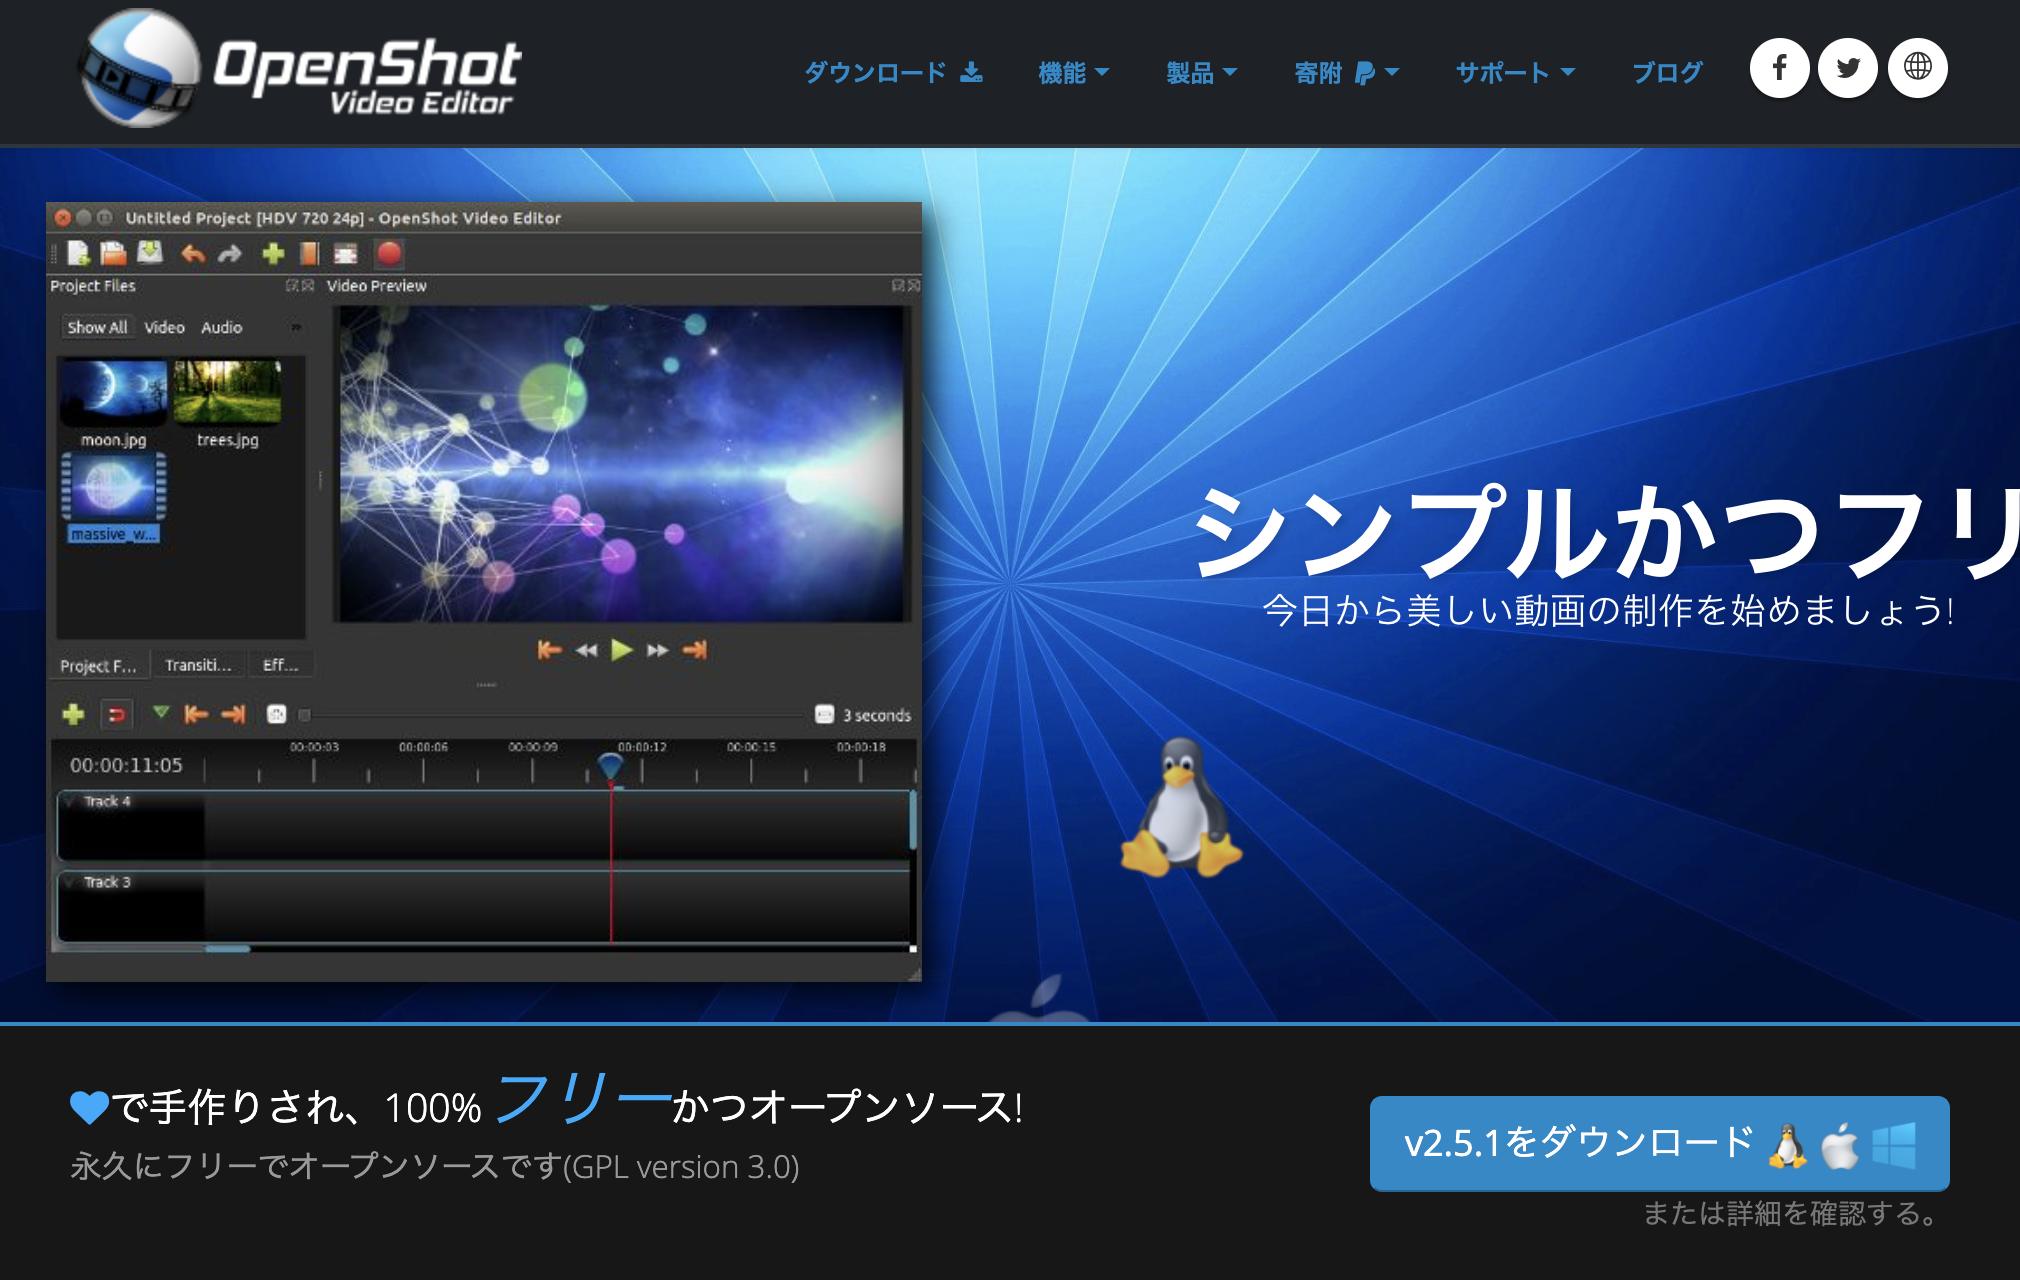 OpenShot Video Editorとは